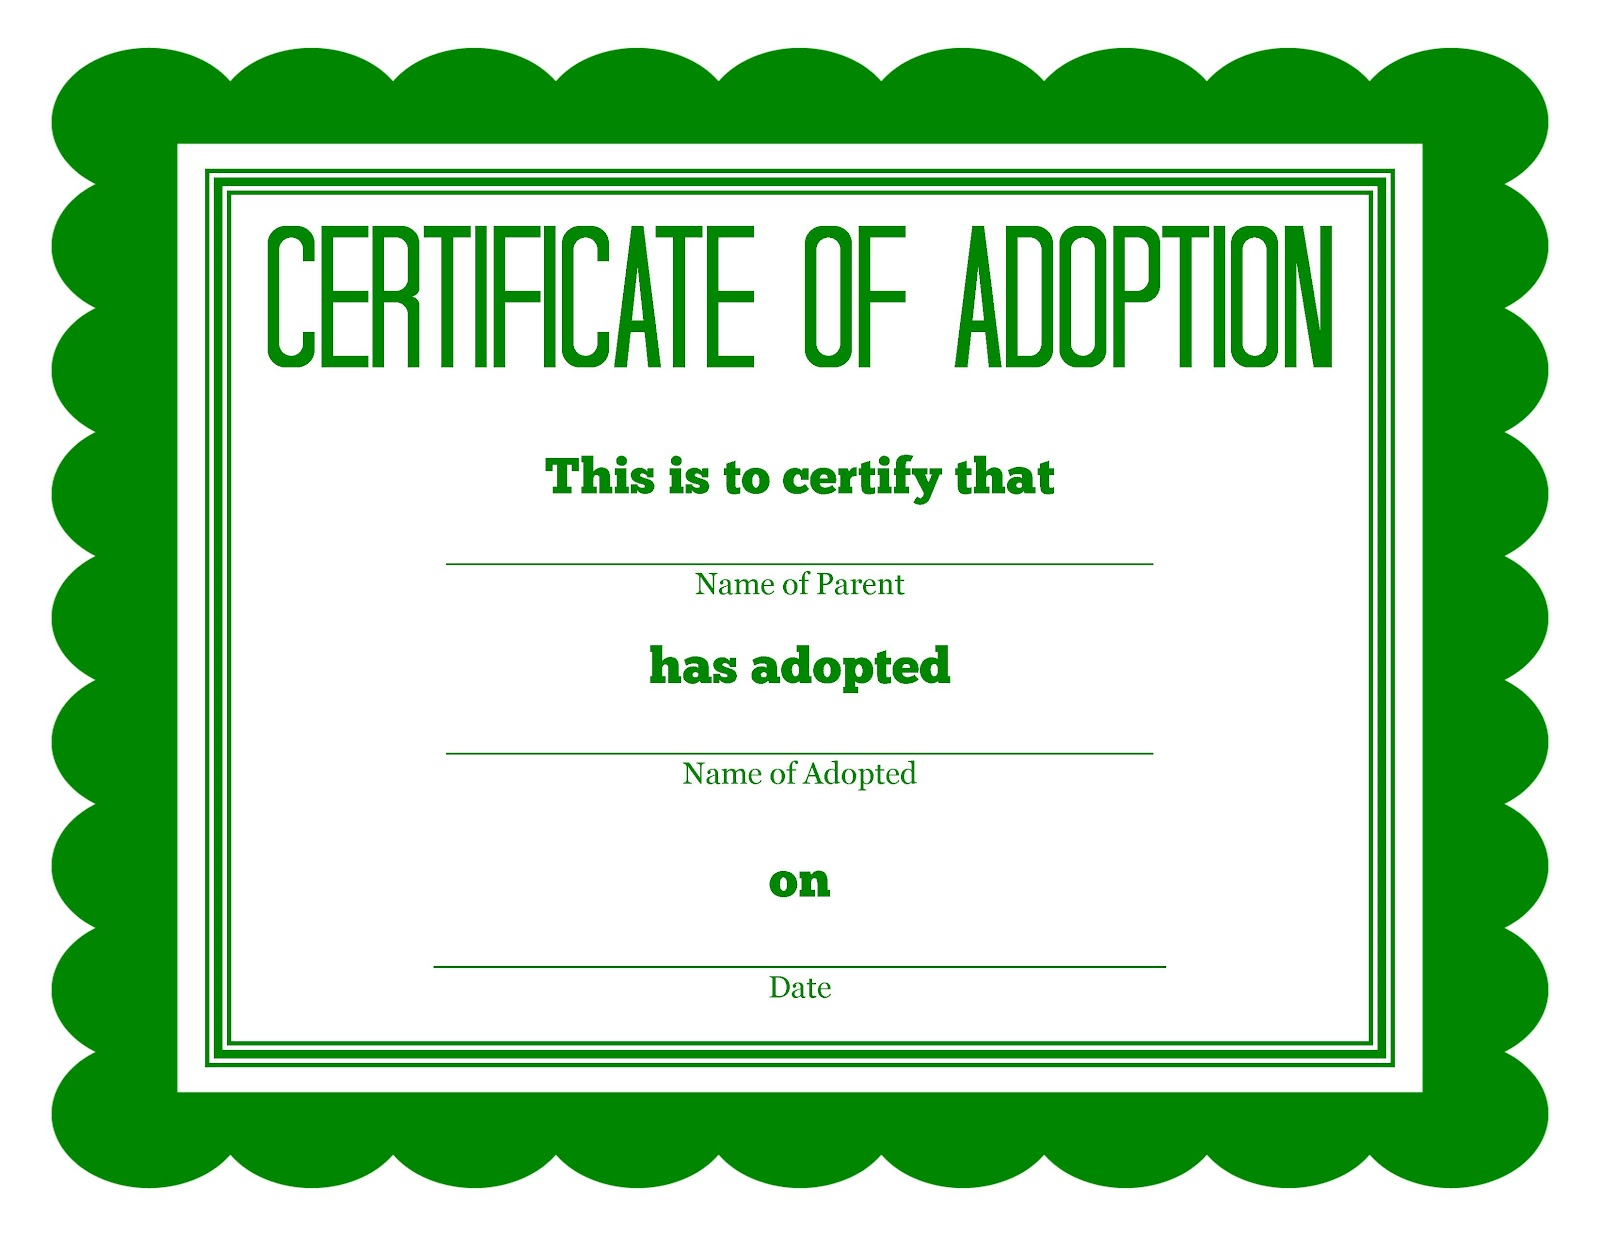 Adoption Certificate Green